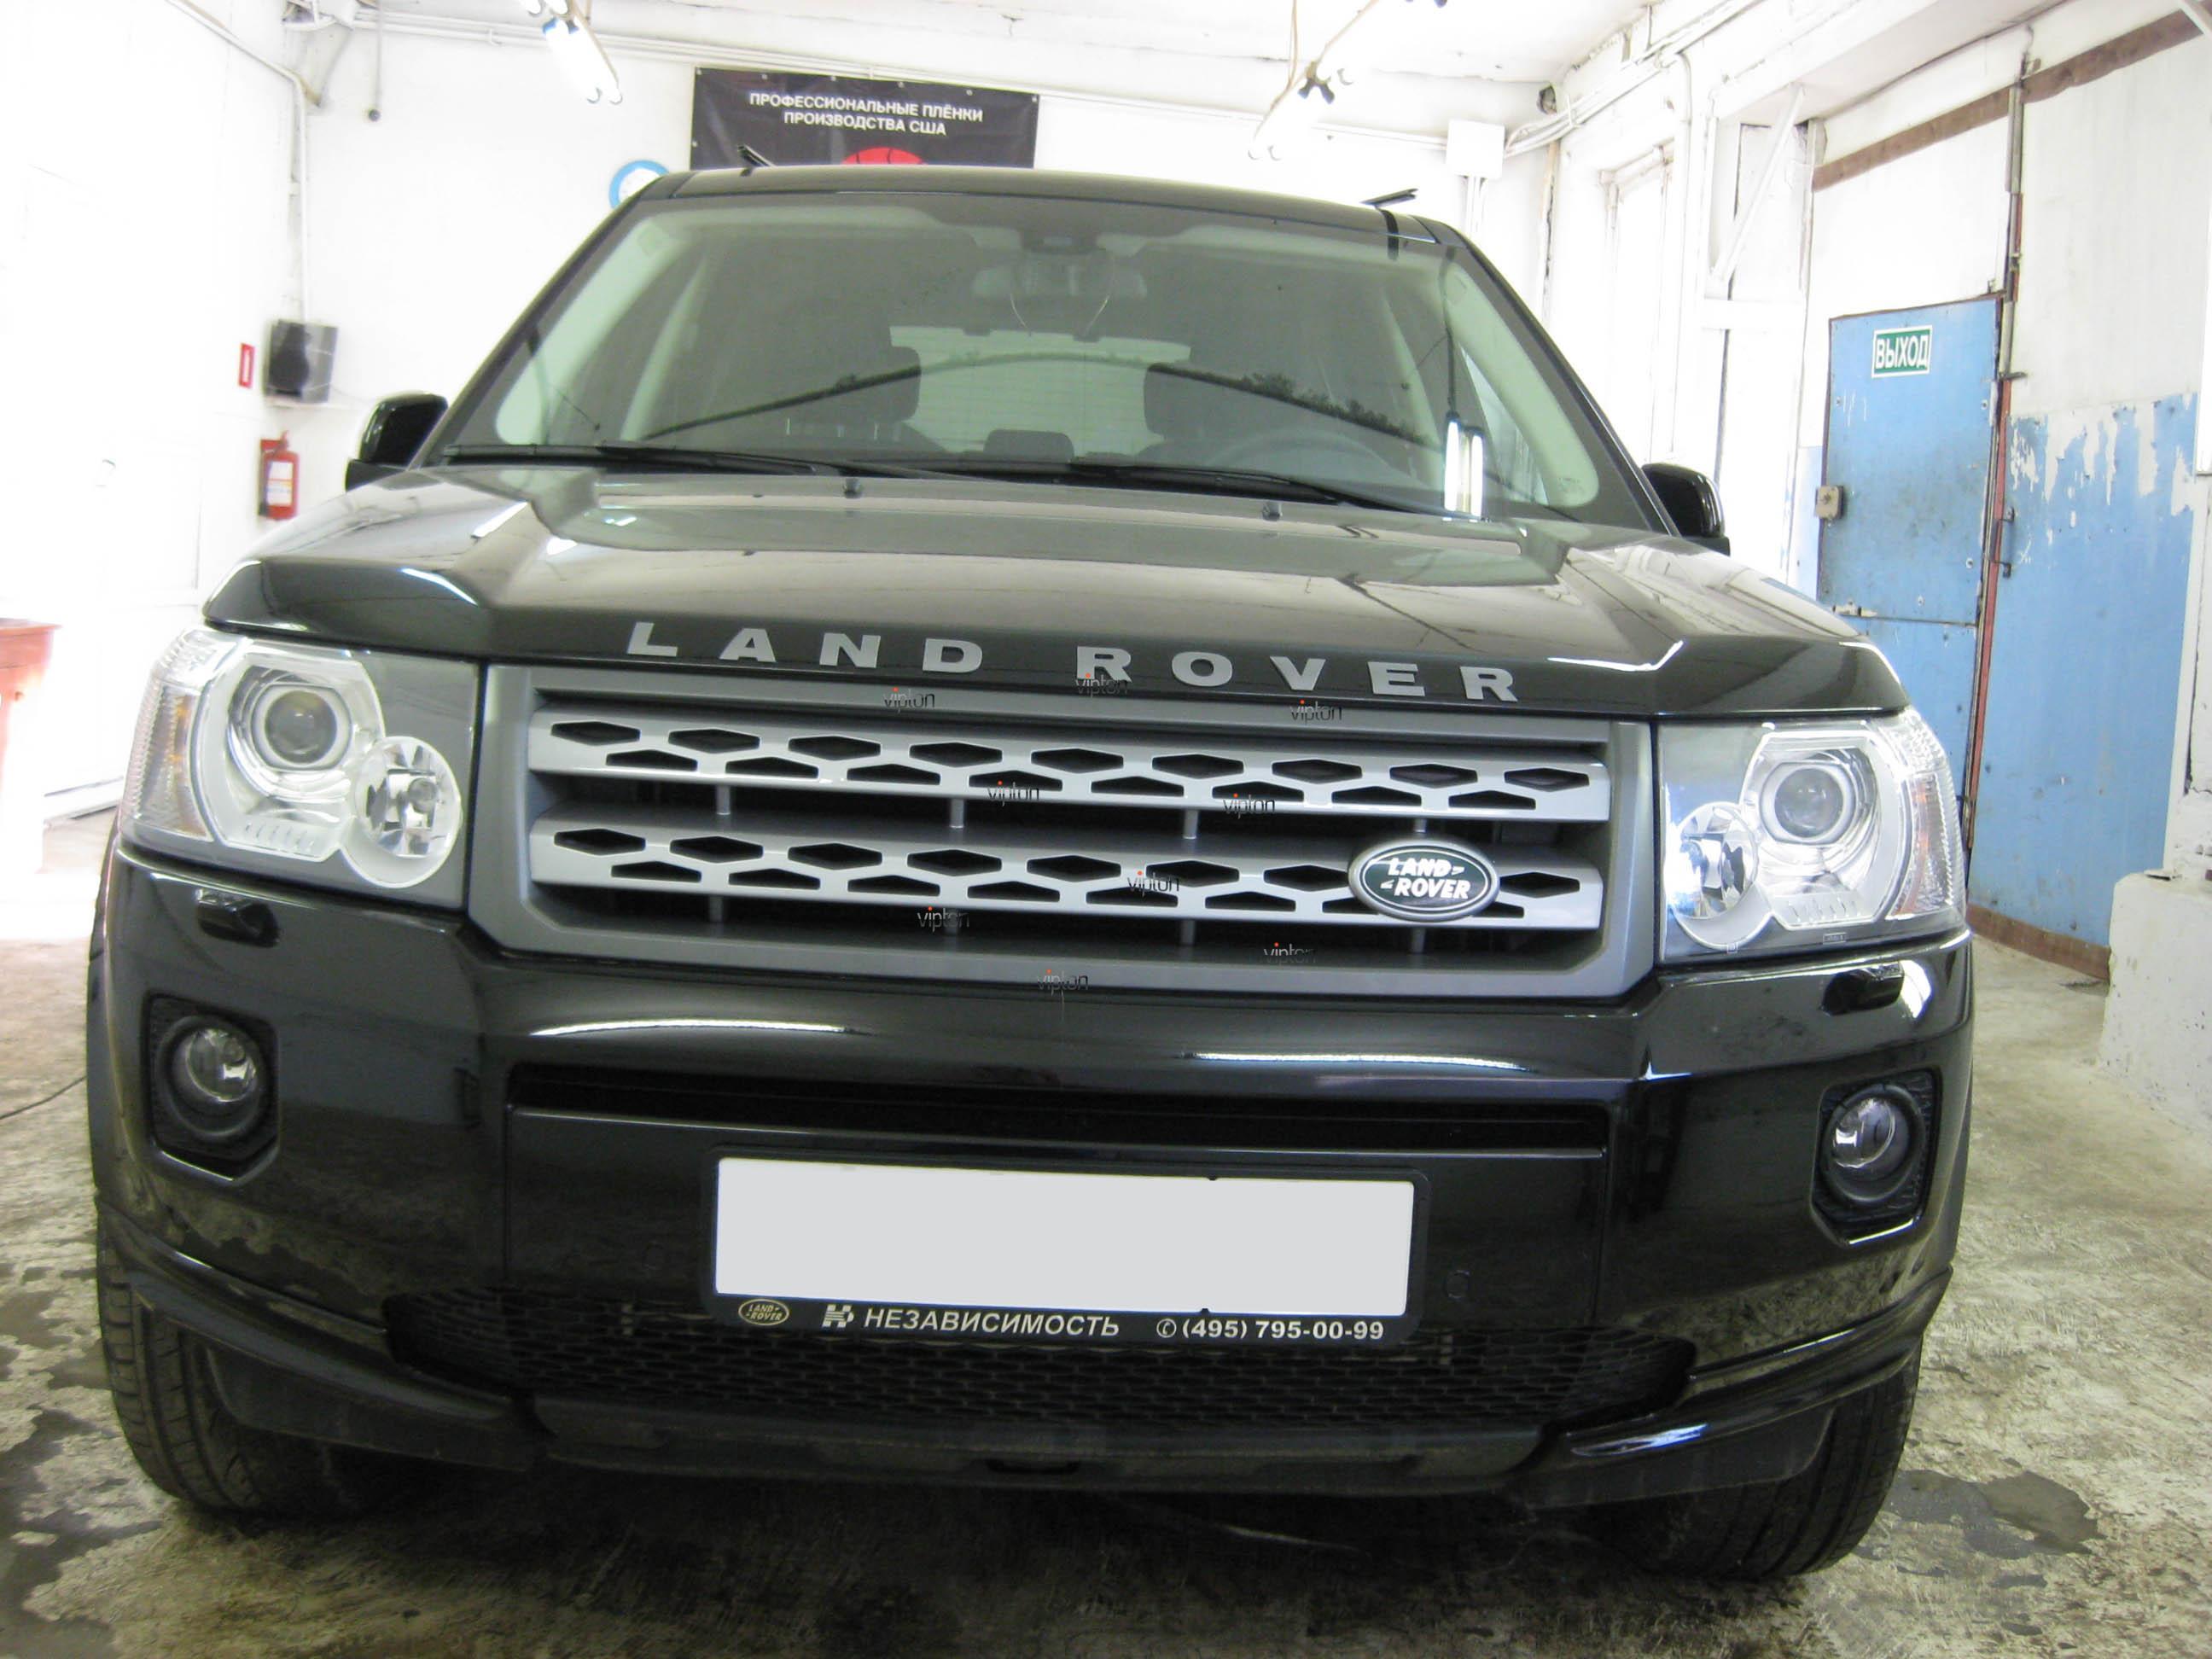 Автомобиль Land Rover Freelander: антигравий 2